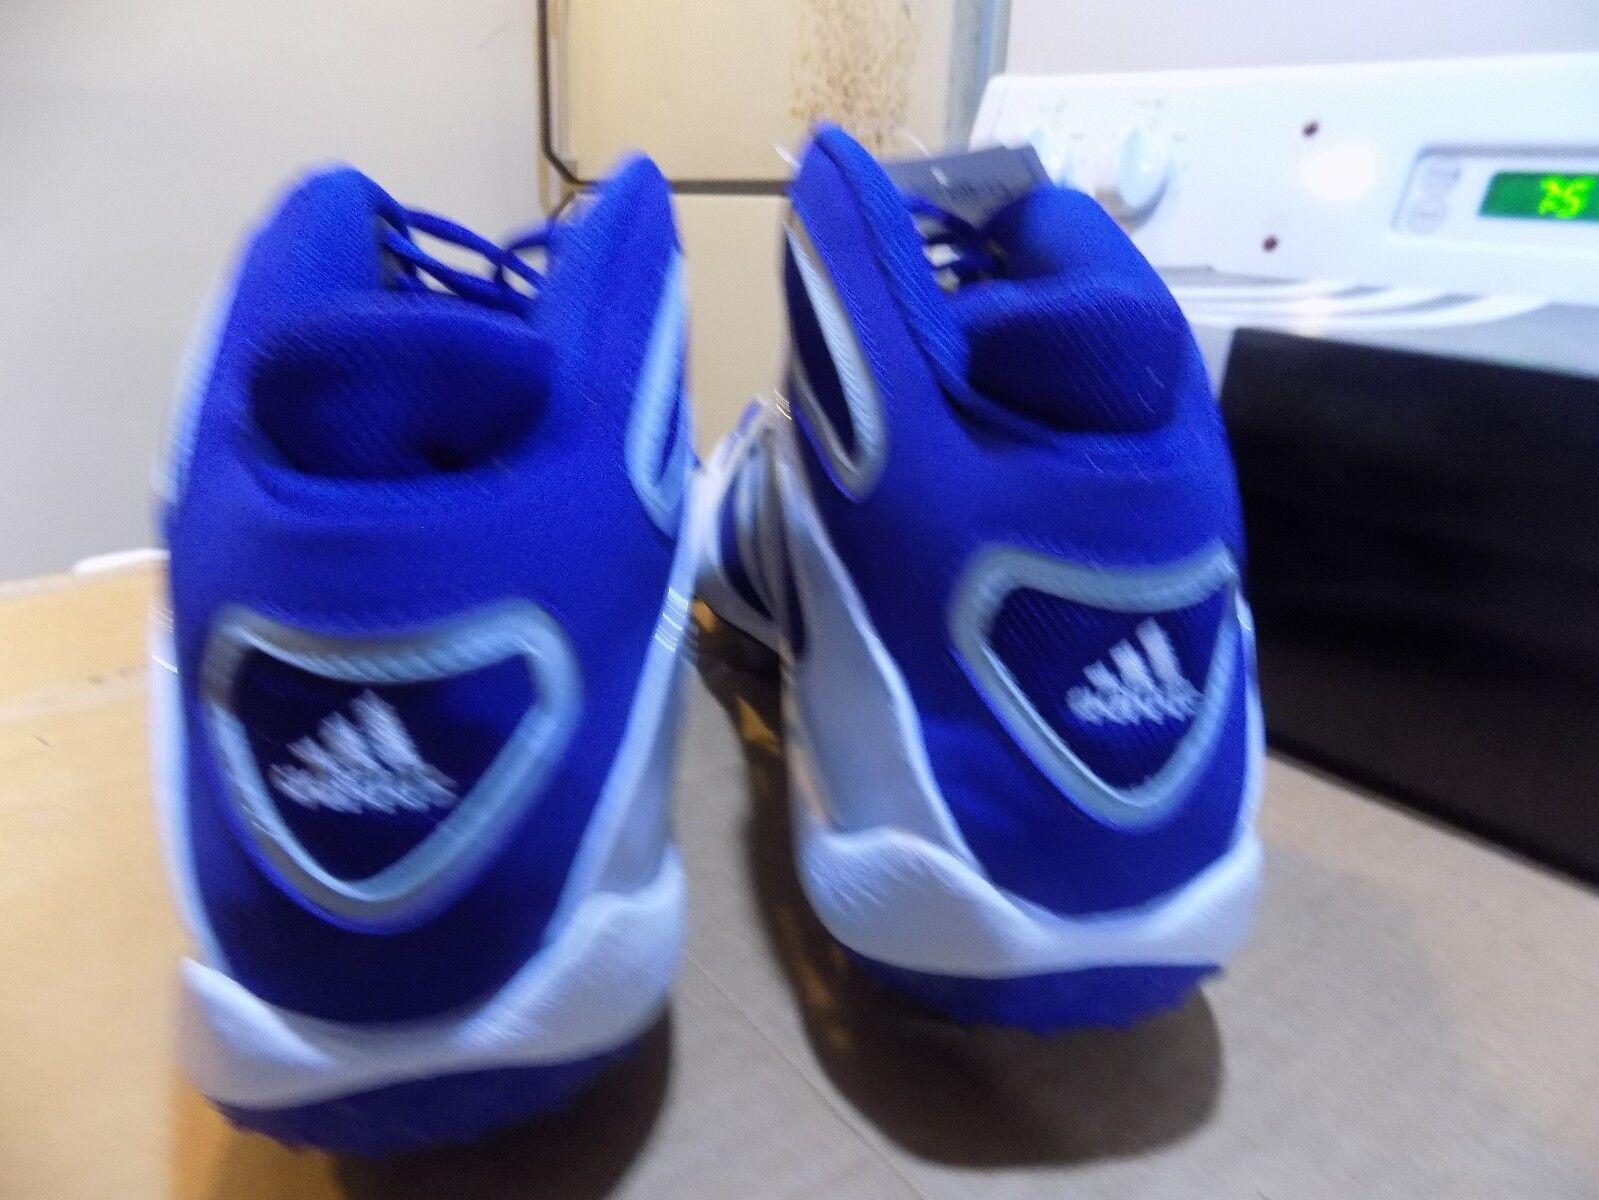 Adidas difesa aeroporto s mid - lacrosse / / / calcio calcio - volume 7 white roy blu d08f05